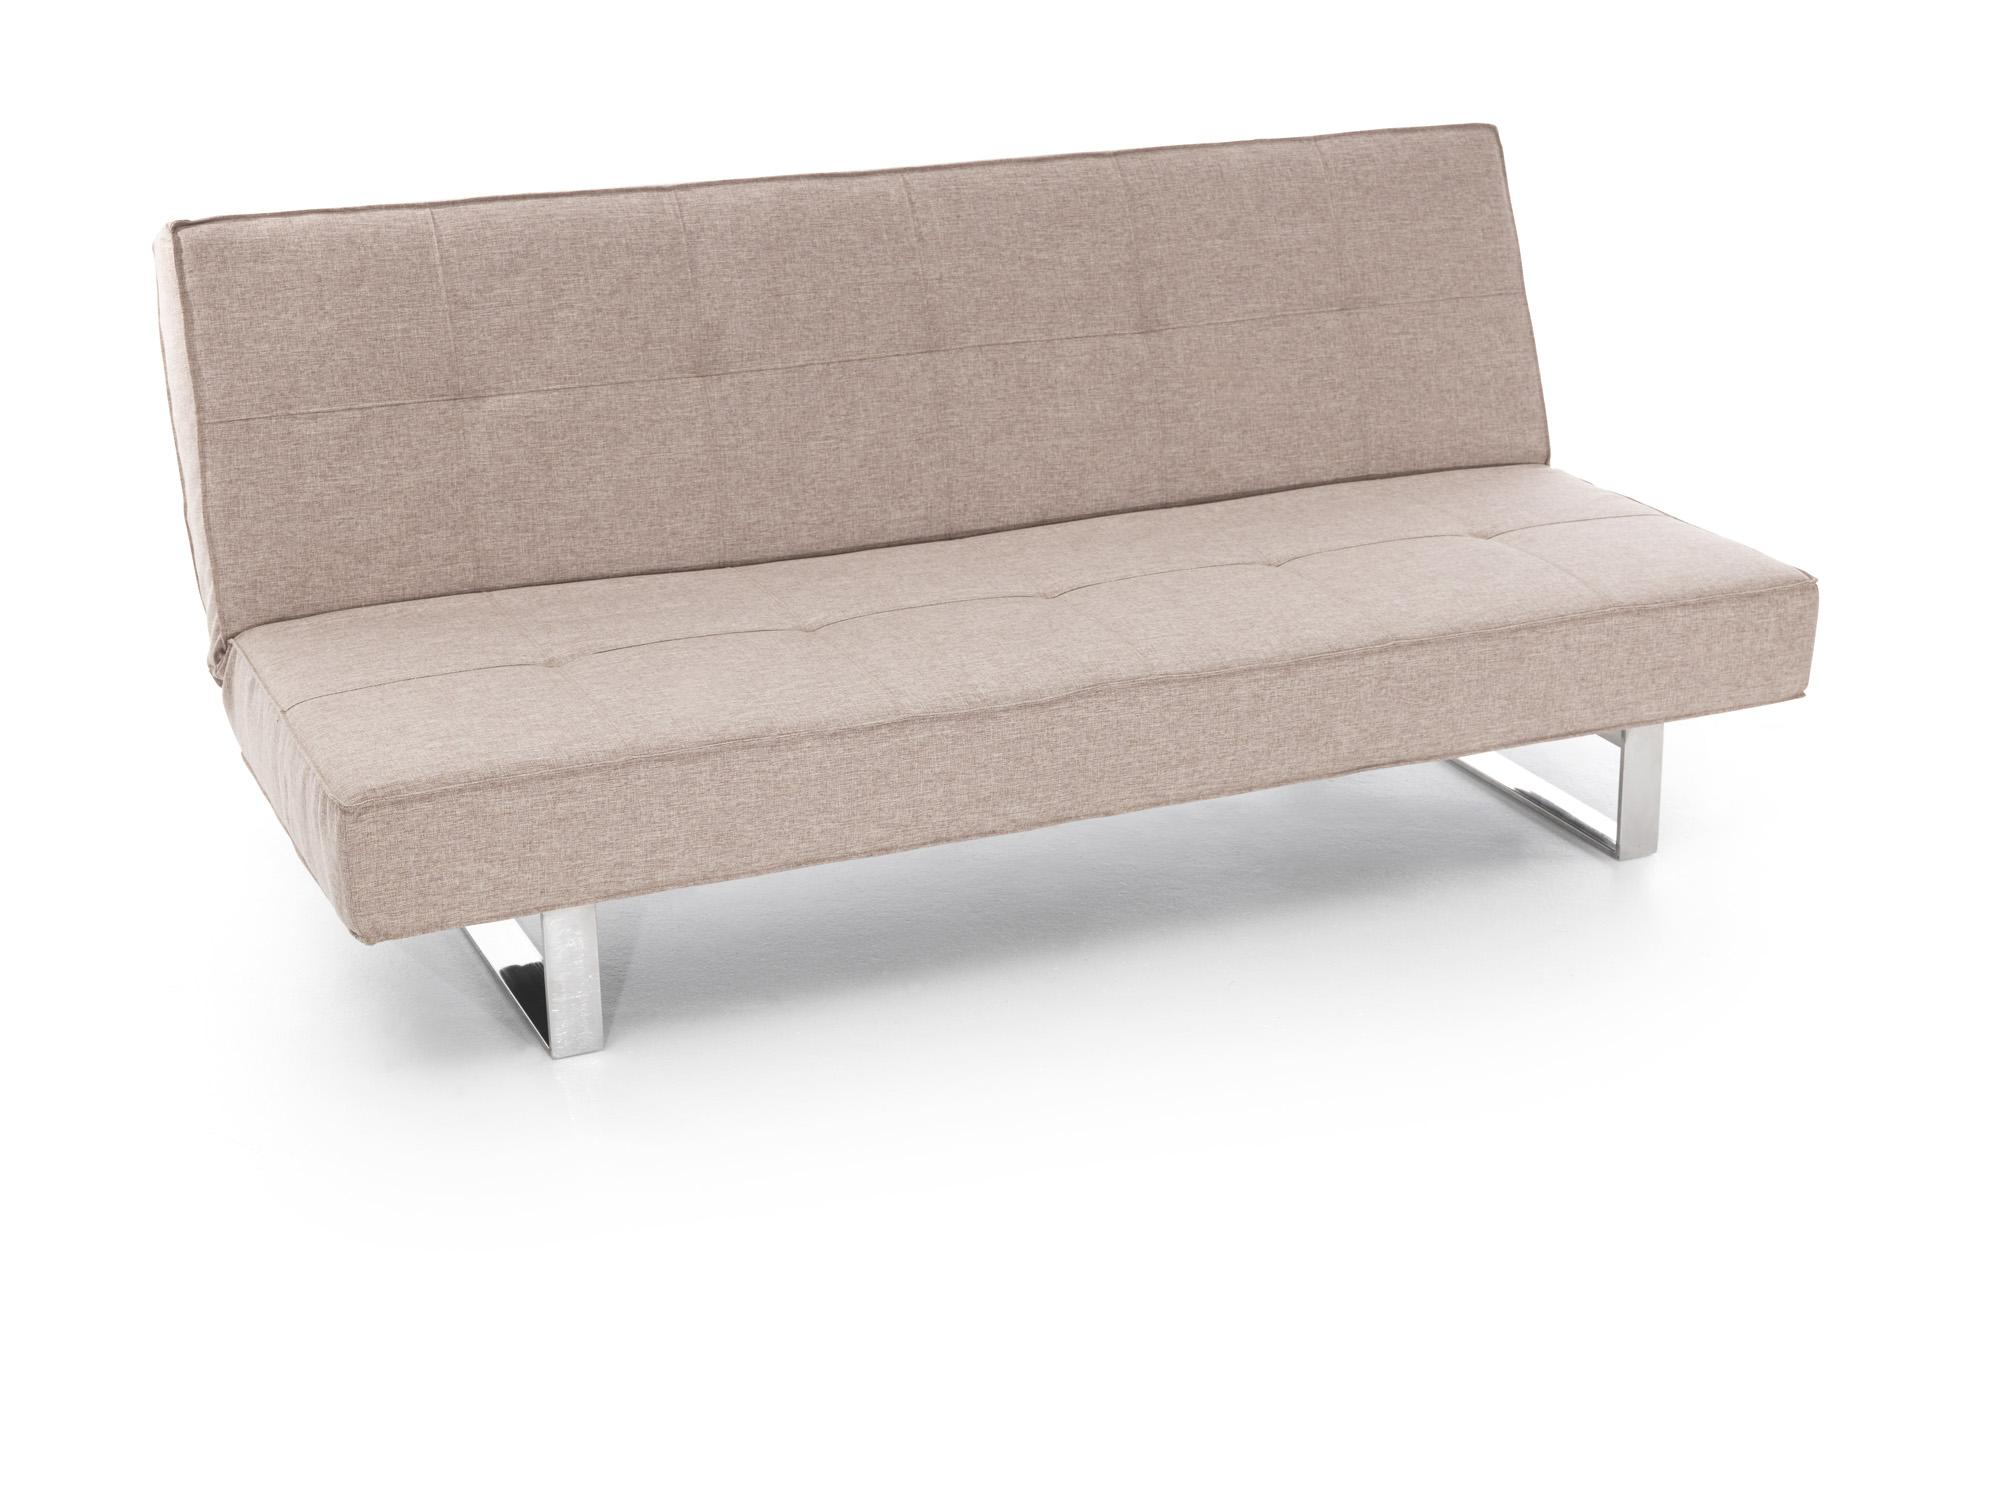 sofa deals uk prestwich friheten bed skiftebo dark orange top 30 cheapest click clack prices best